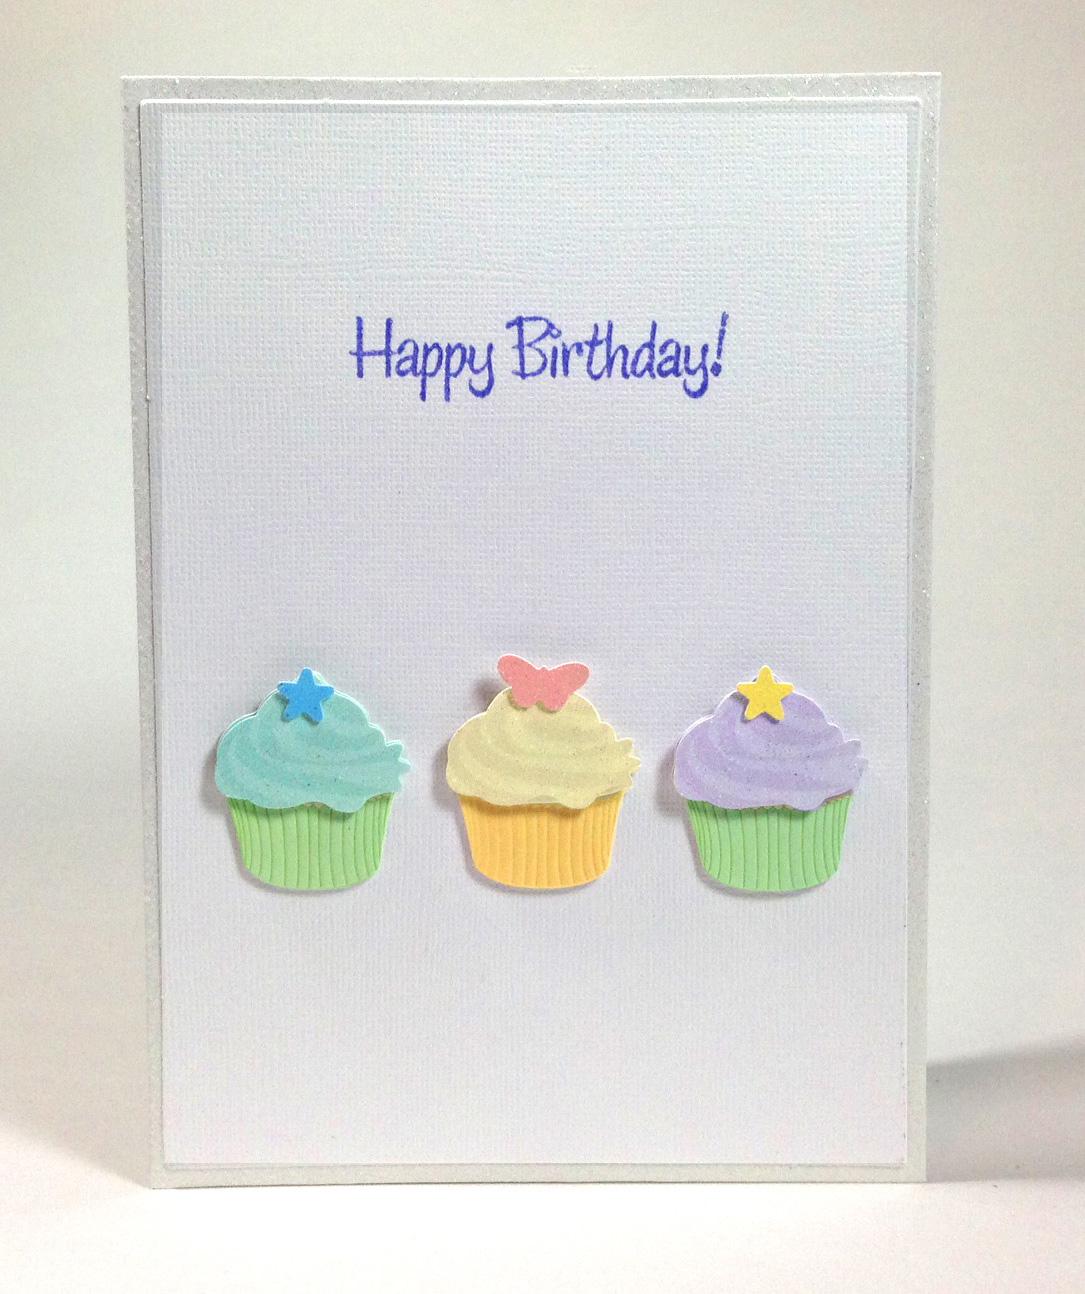 365 designs simple birthday card in 3 steps